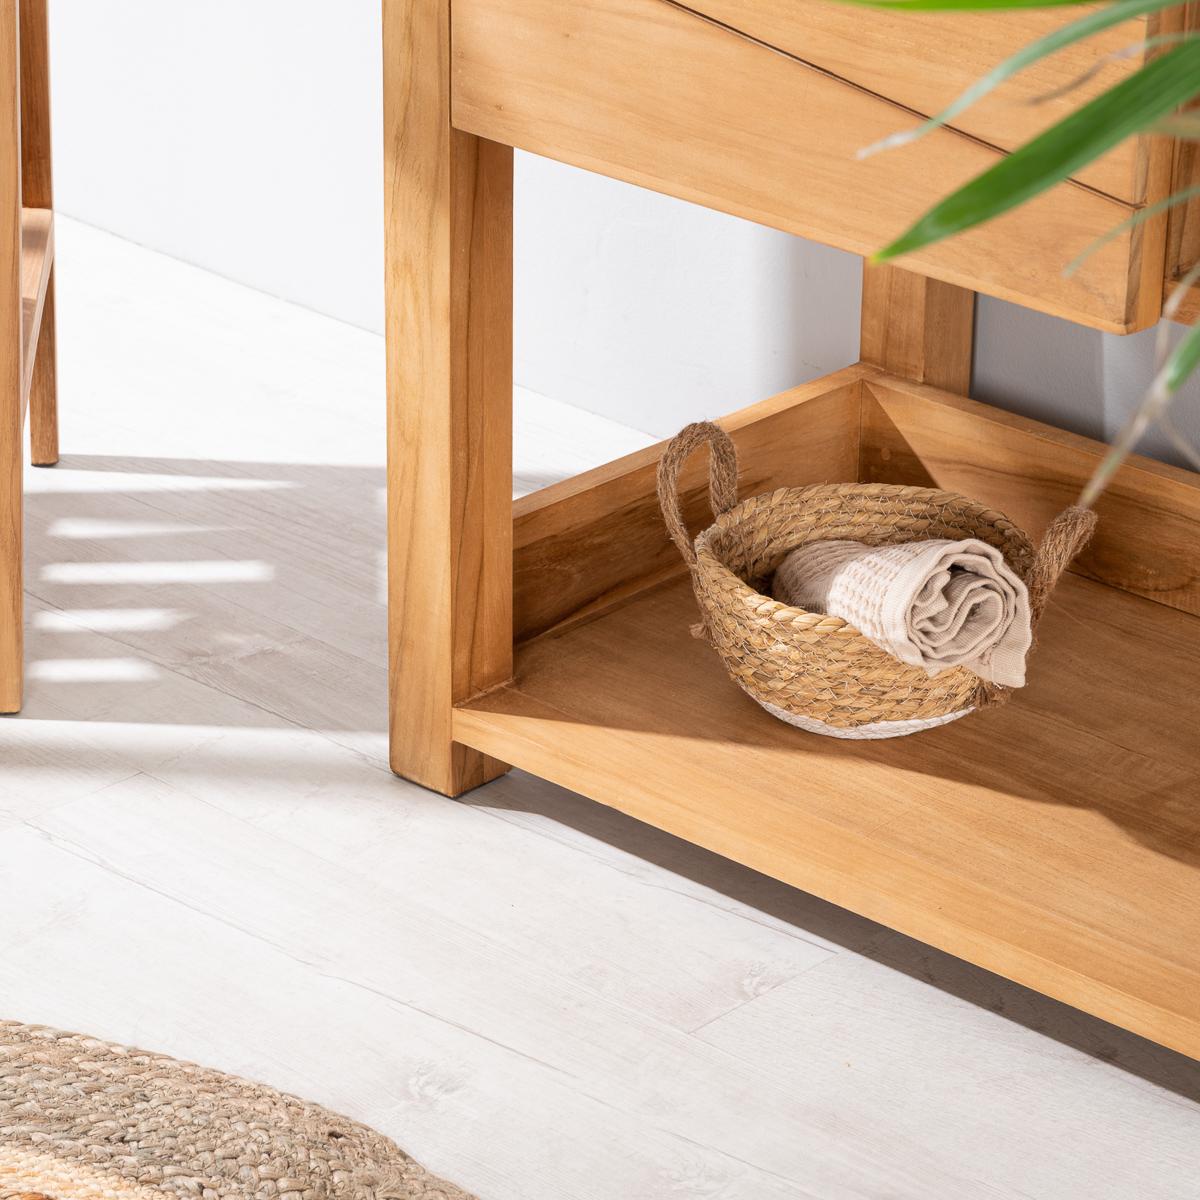 Neuf meuble en teck massif cosy 67cm vasque noir ebay for Salle de bain noir et bois